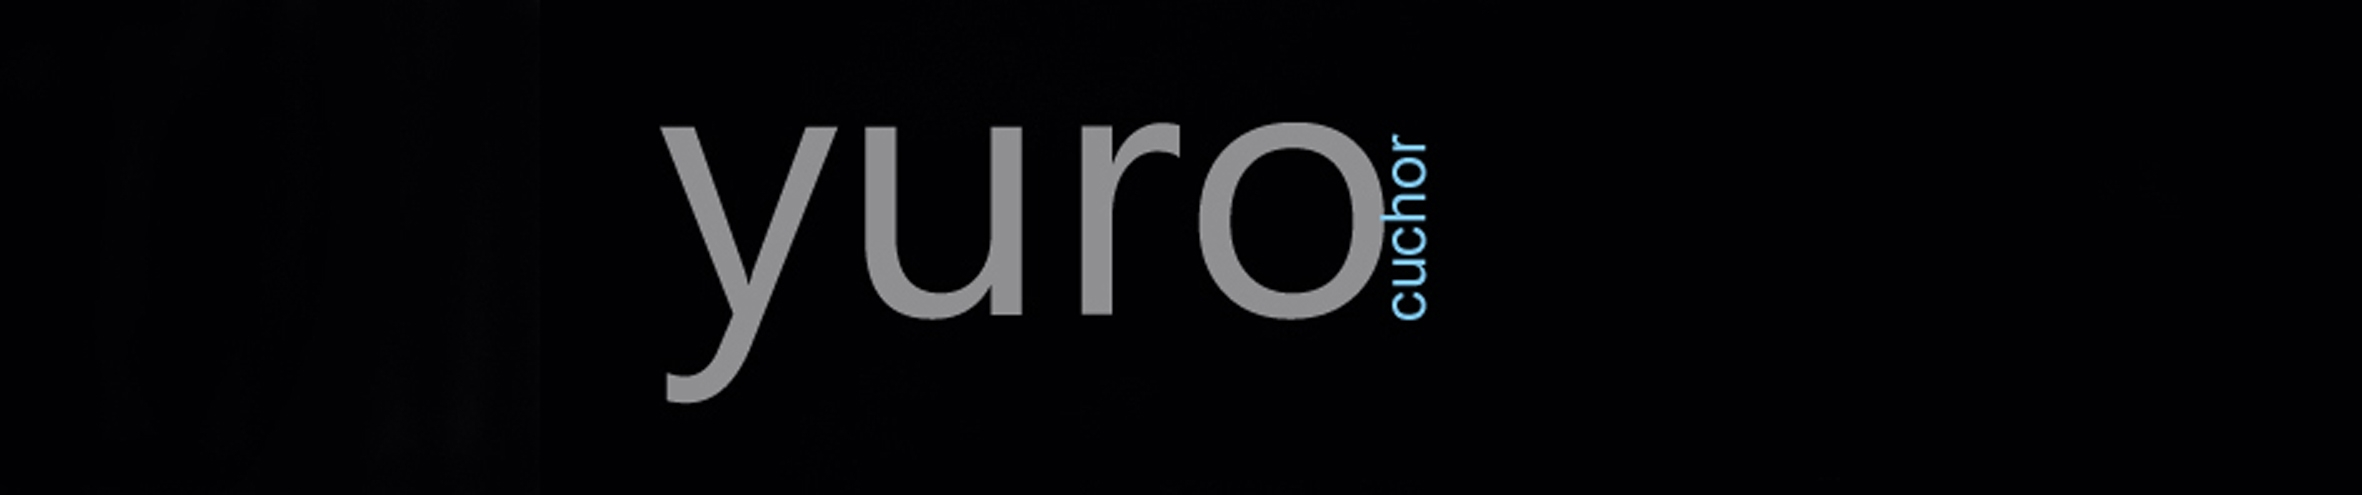 Yuro Cuchor (@yuro_cuchor) Cover Image